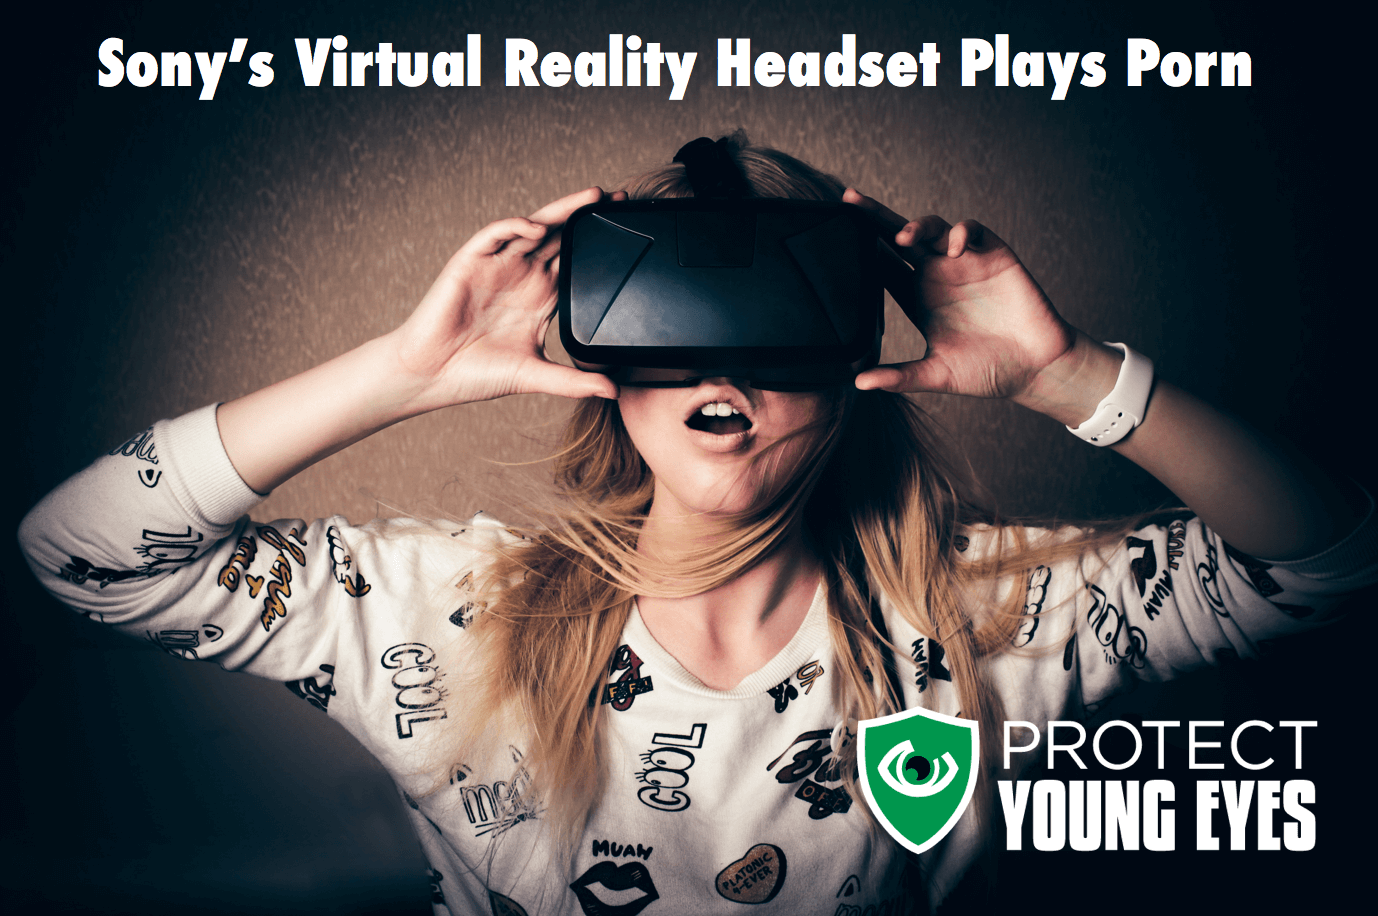 Sony Virtual Reality headset